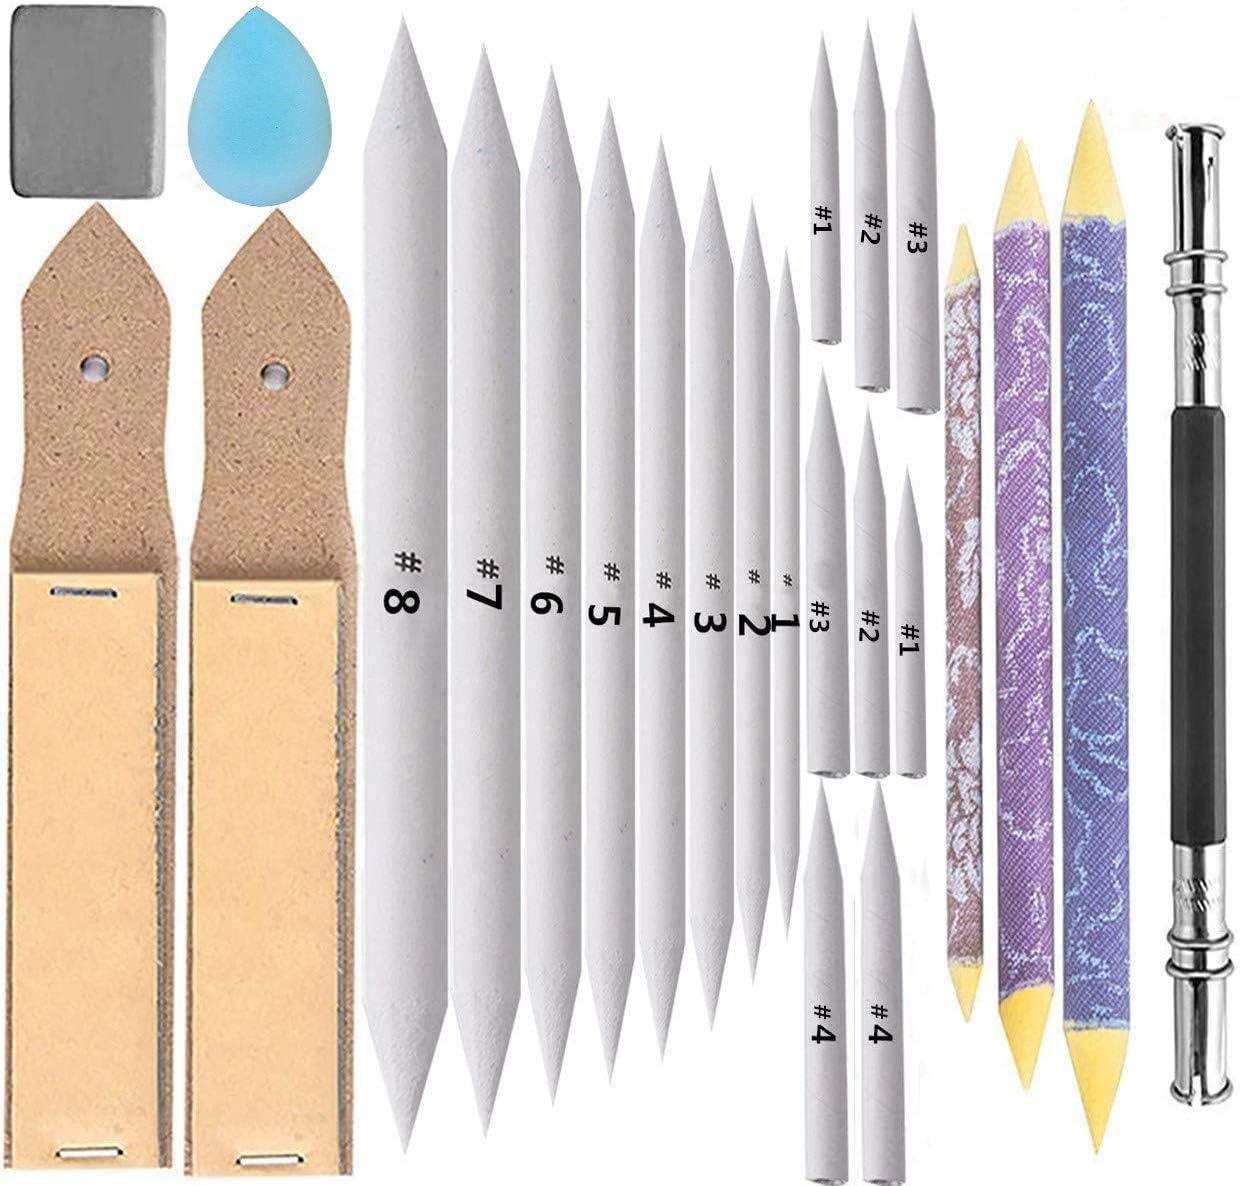 24 Pieces Blending Stumps and Tortillions Set with 2 Pcs Sandpaper Pencil Sharpener 1 Pencil Extension Tool 1 Eraser for Art Blenders Student Sketch Drawing kit